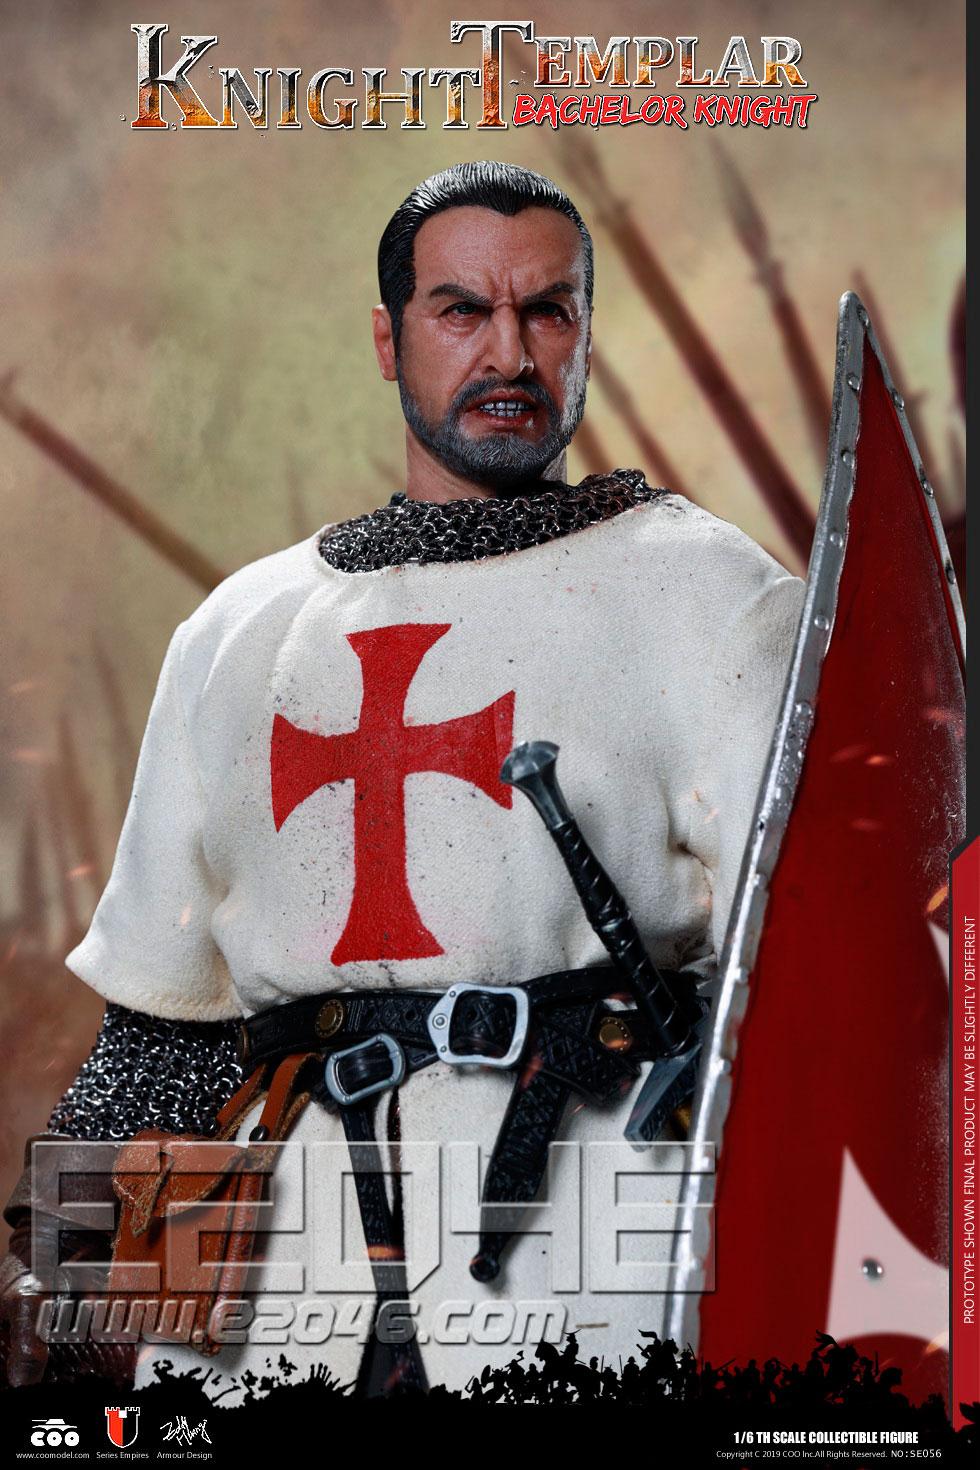 Bachelor Of Knights Templar (DOLL)